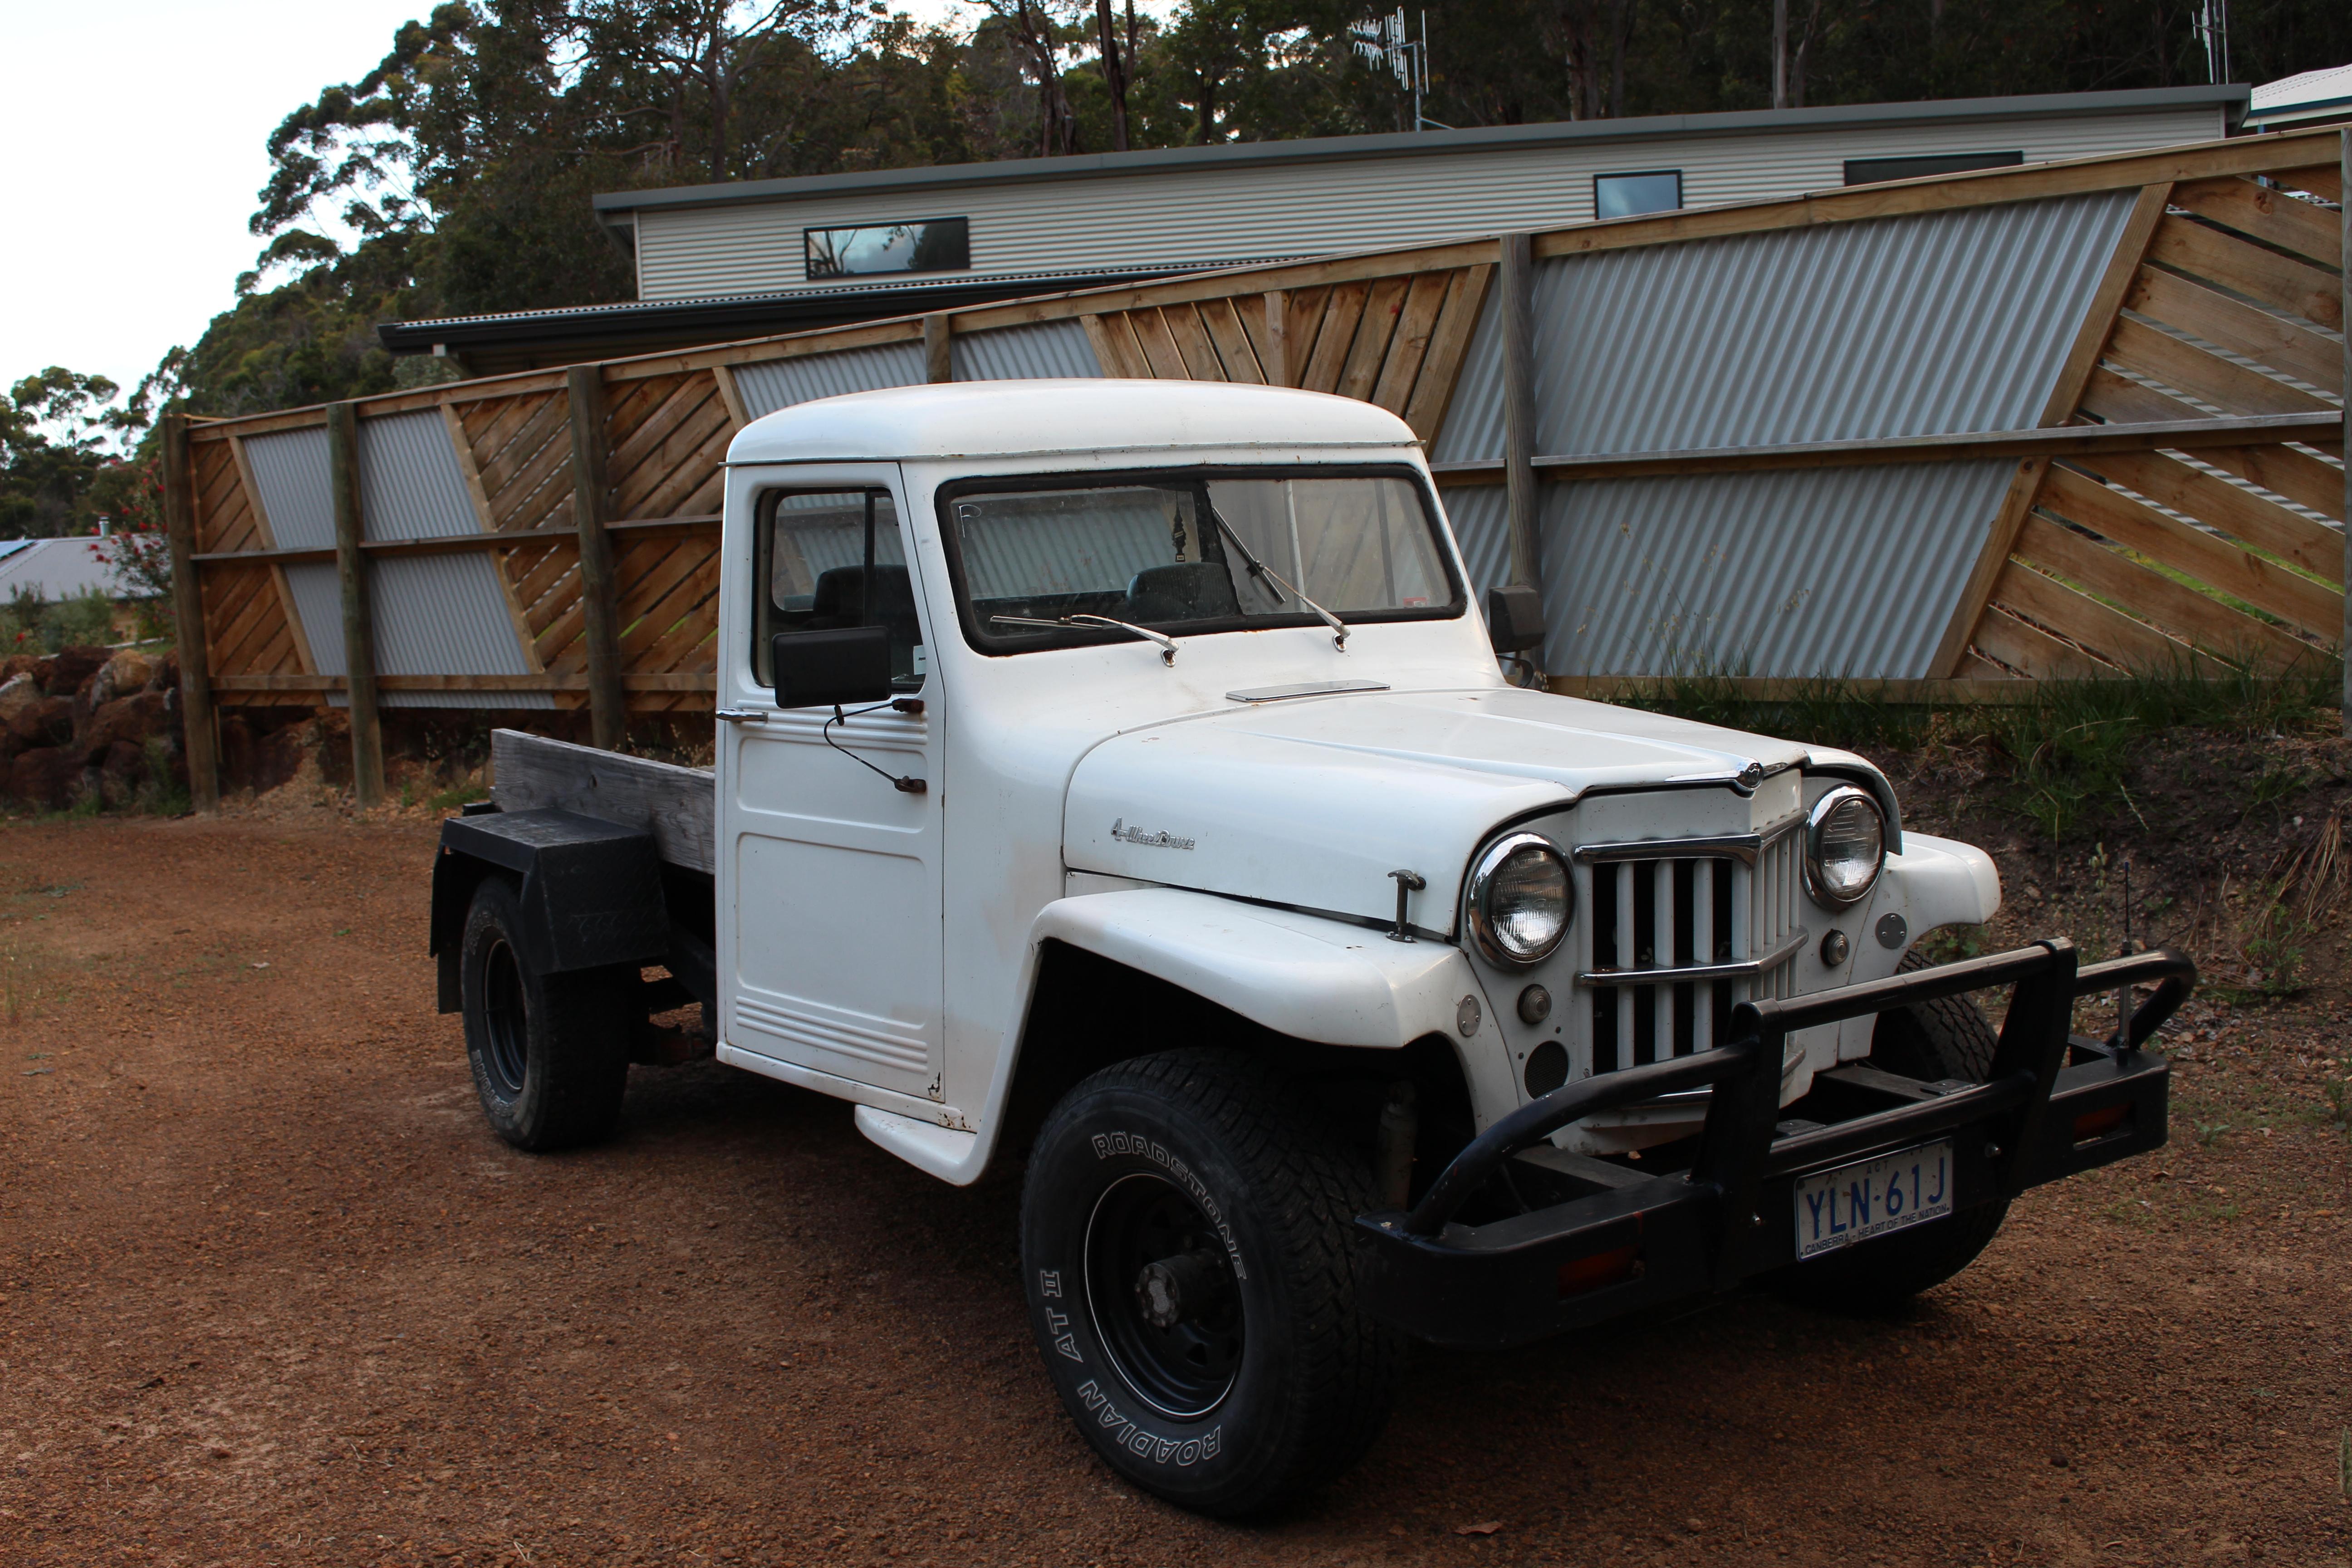 Rare Aussie1966 Willys 4x4 Pickup - Vintage Jeep® Vehicles 1941-71 ...